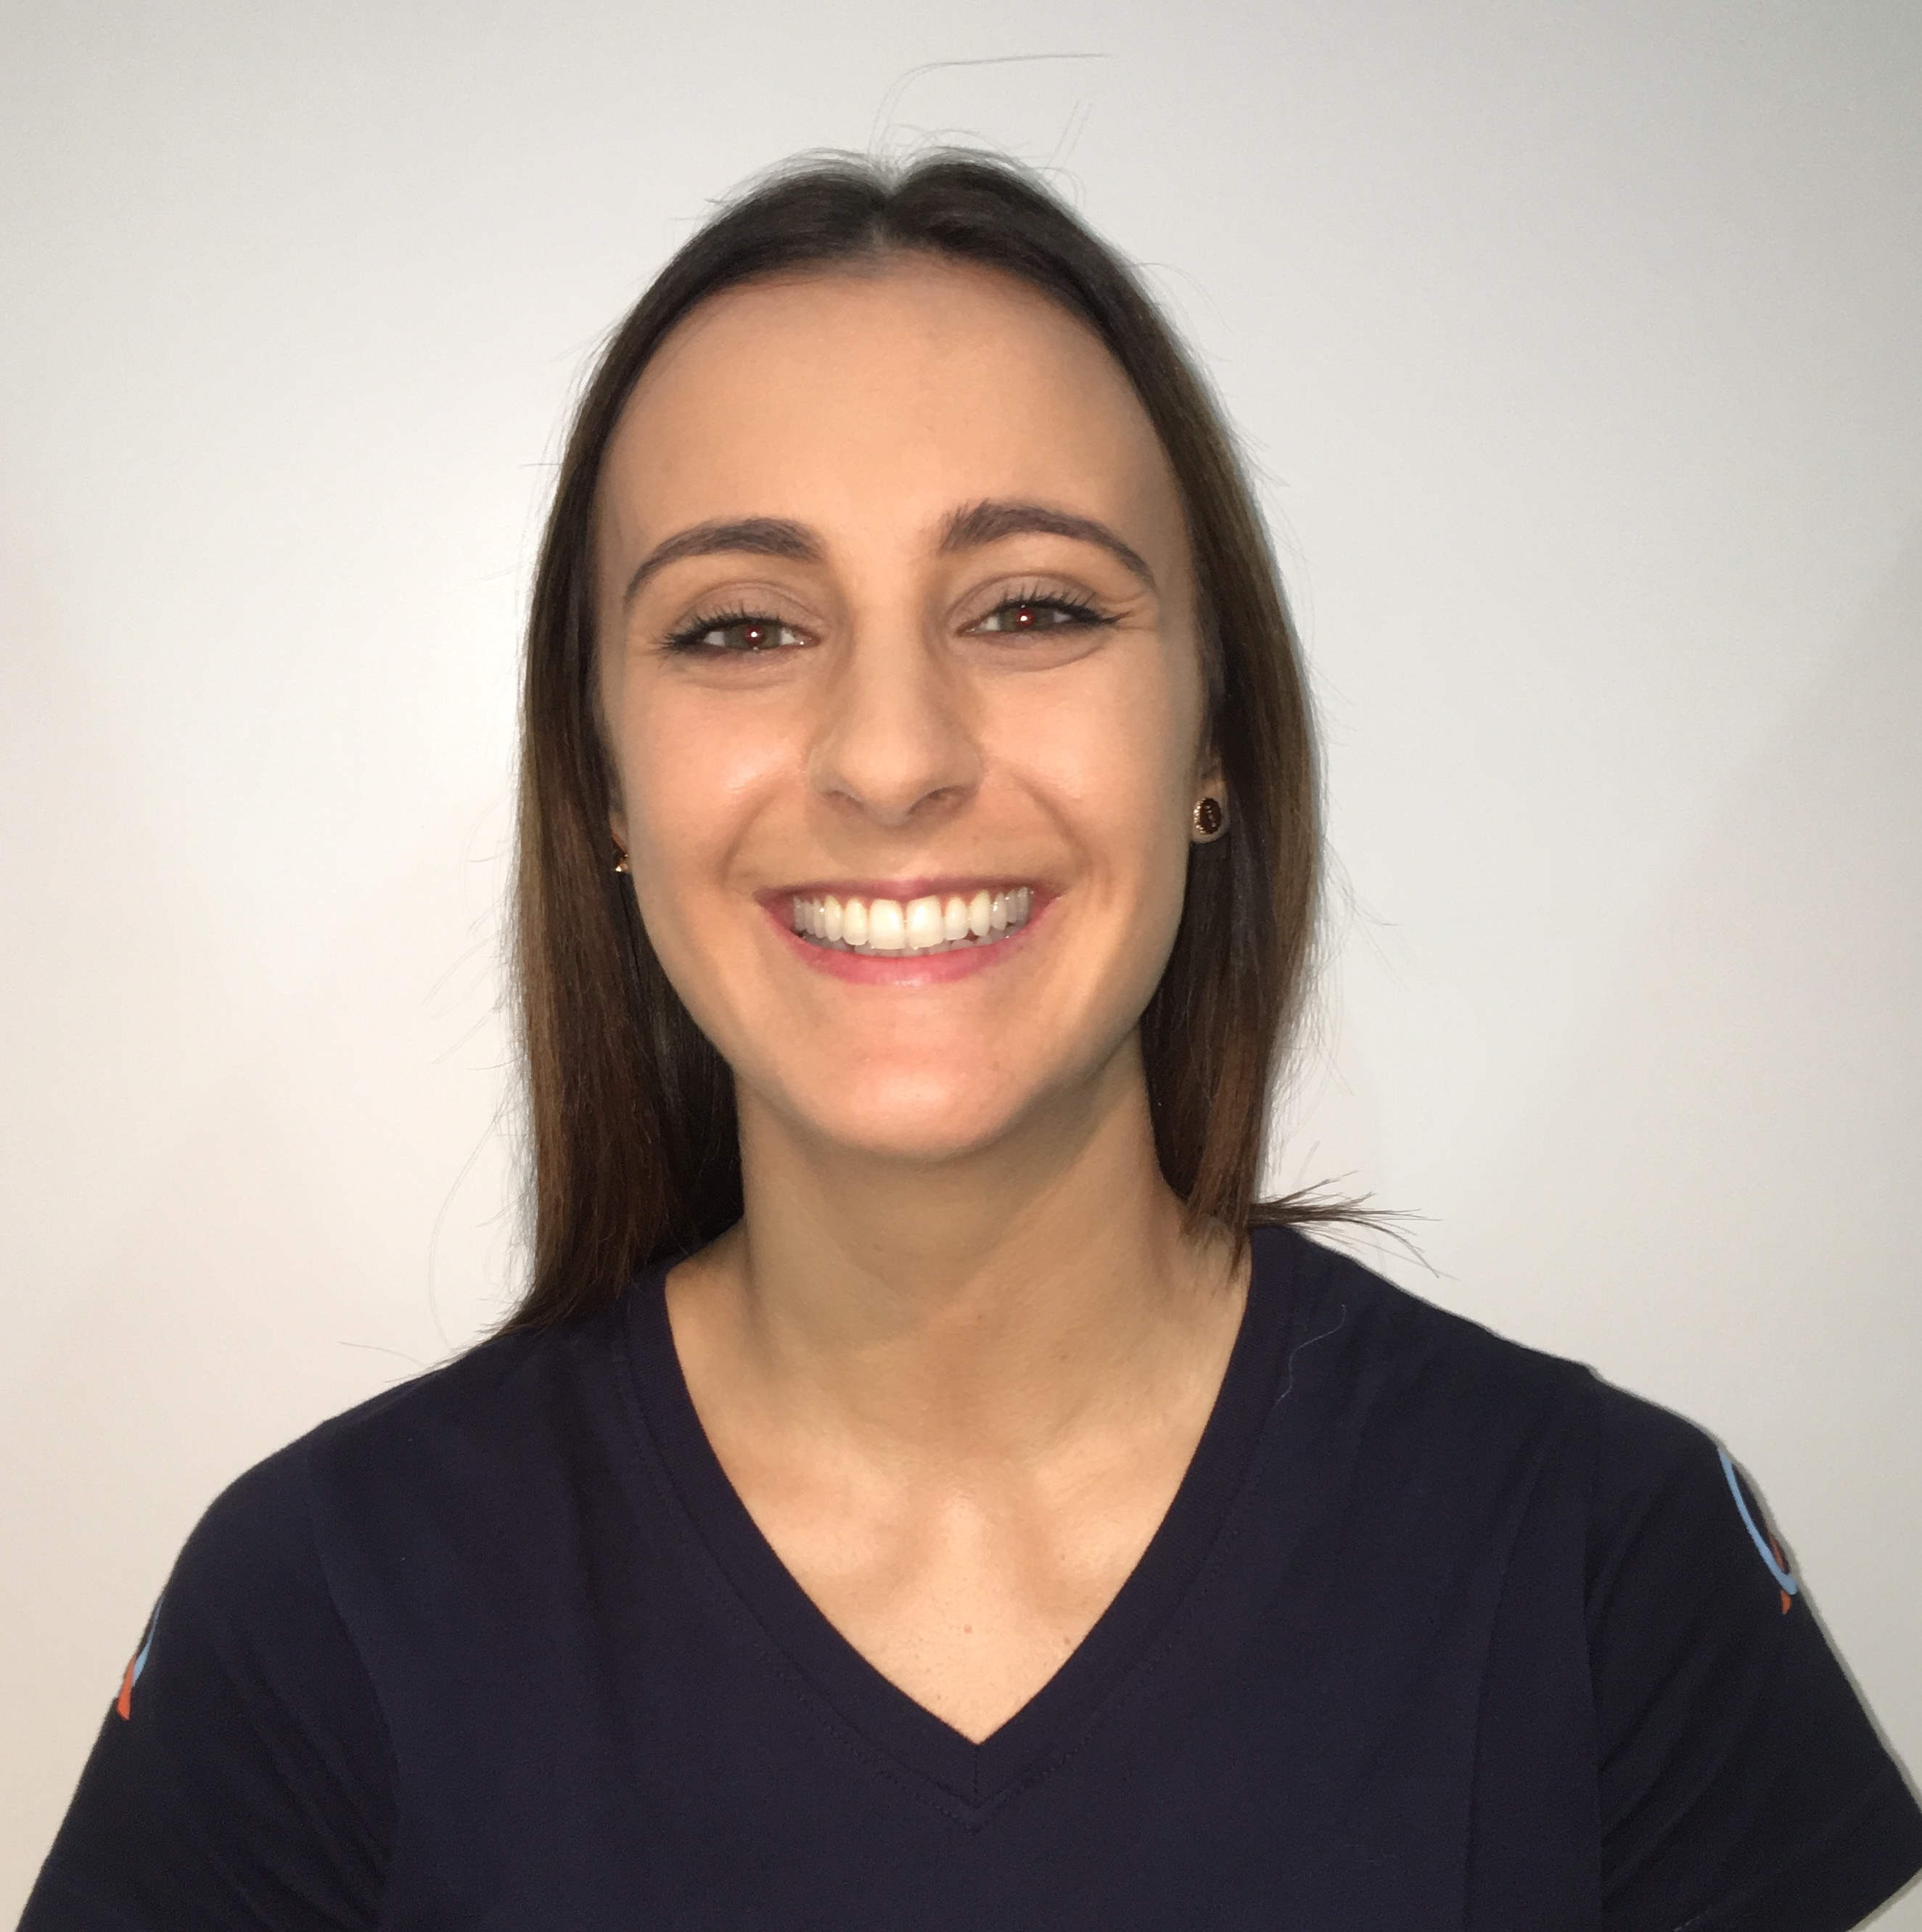 Amelia Di Fabio